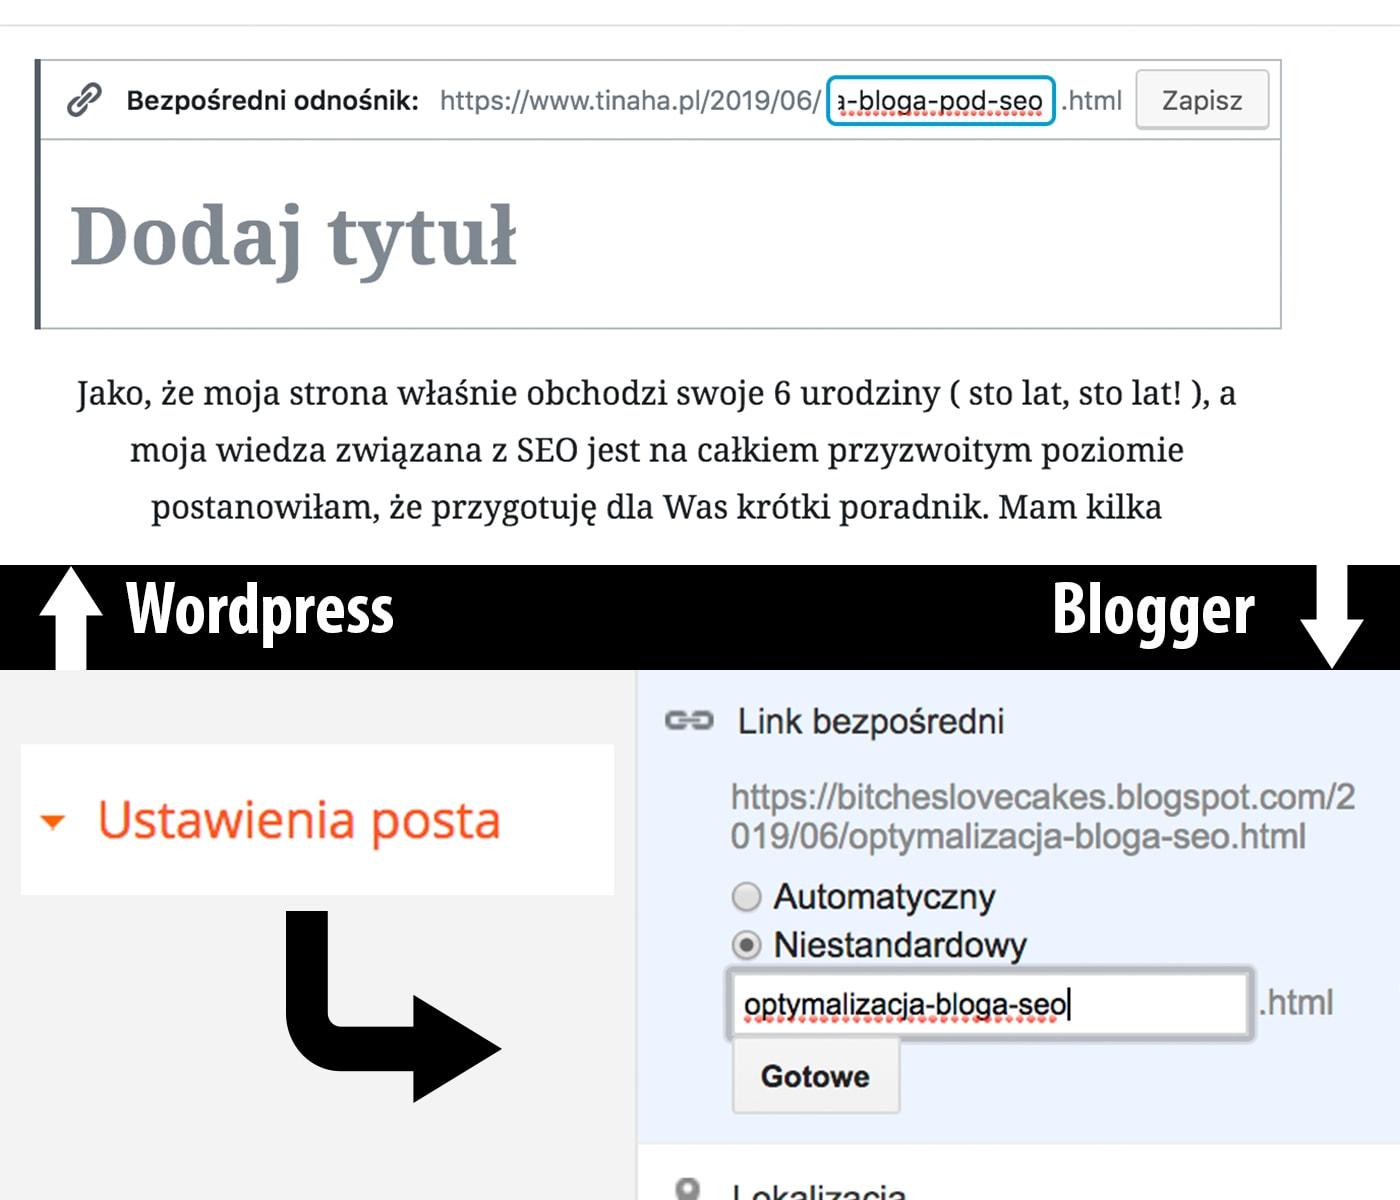 optymalizacja bloga pod SEO